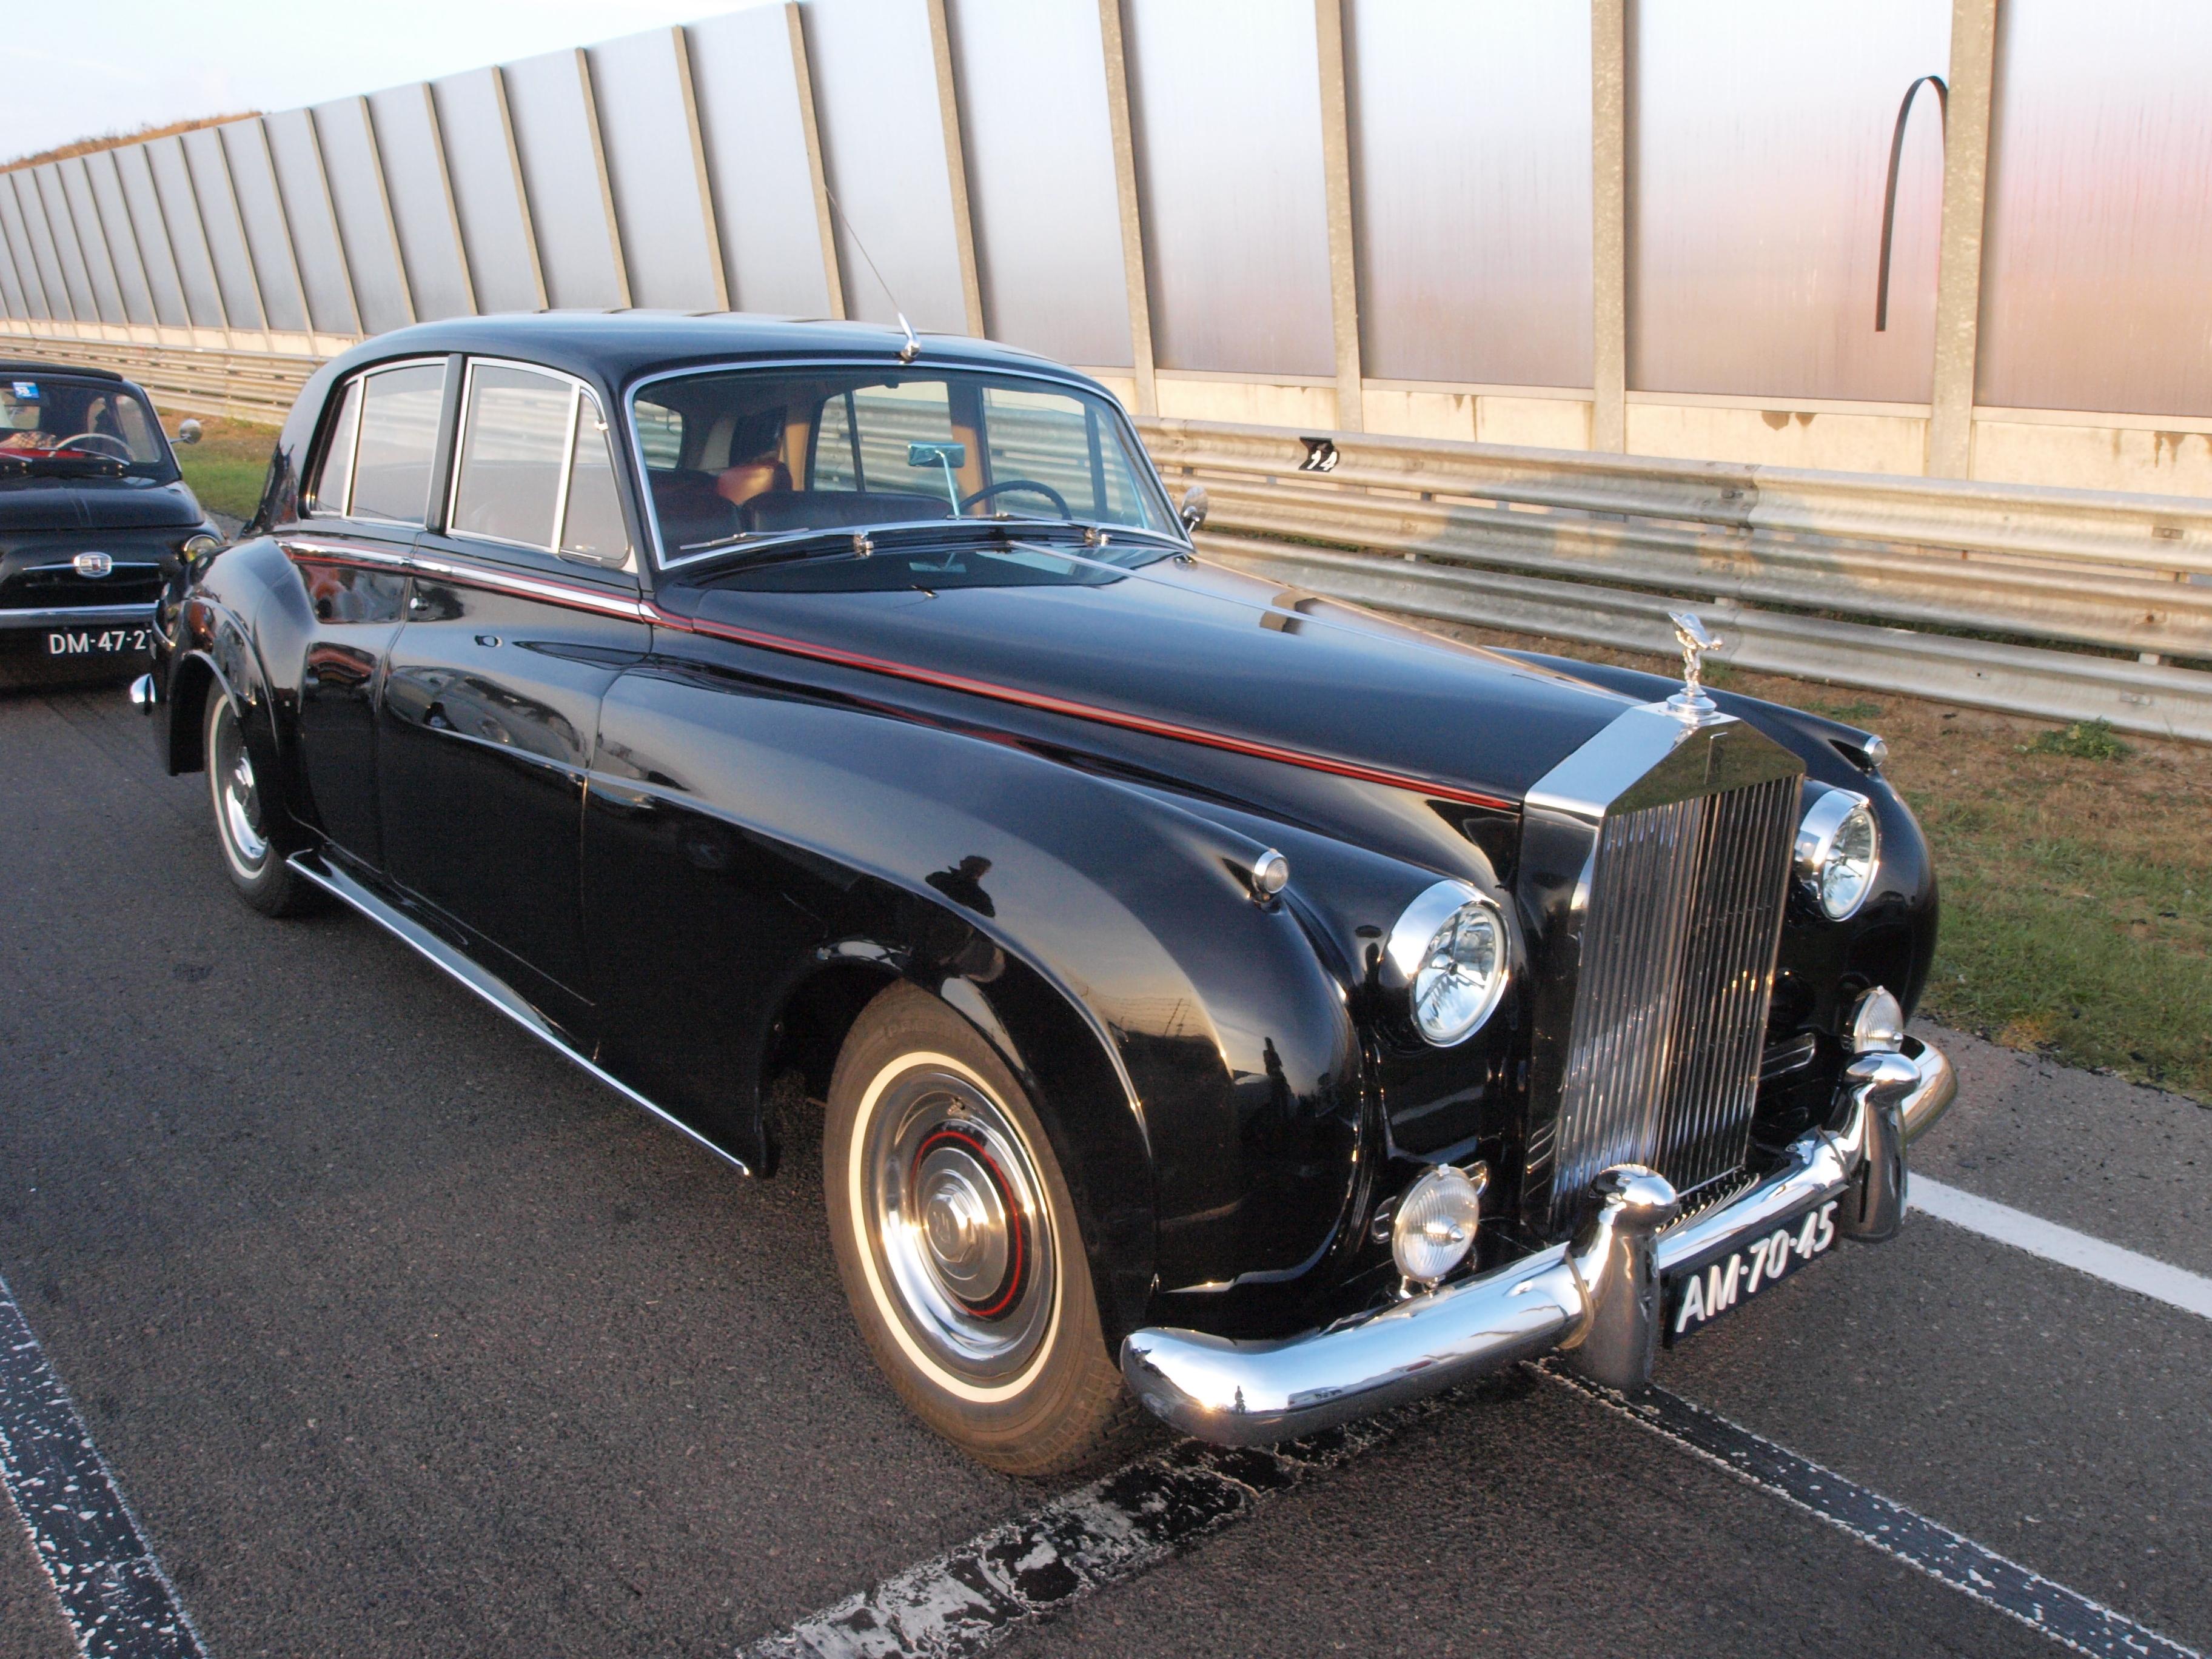 File:Rolls Royce Silver Cloud 1 dutch licence registration AM-70-45